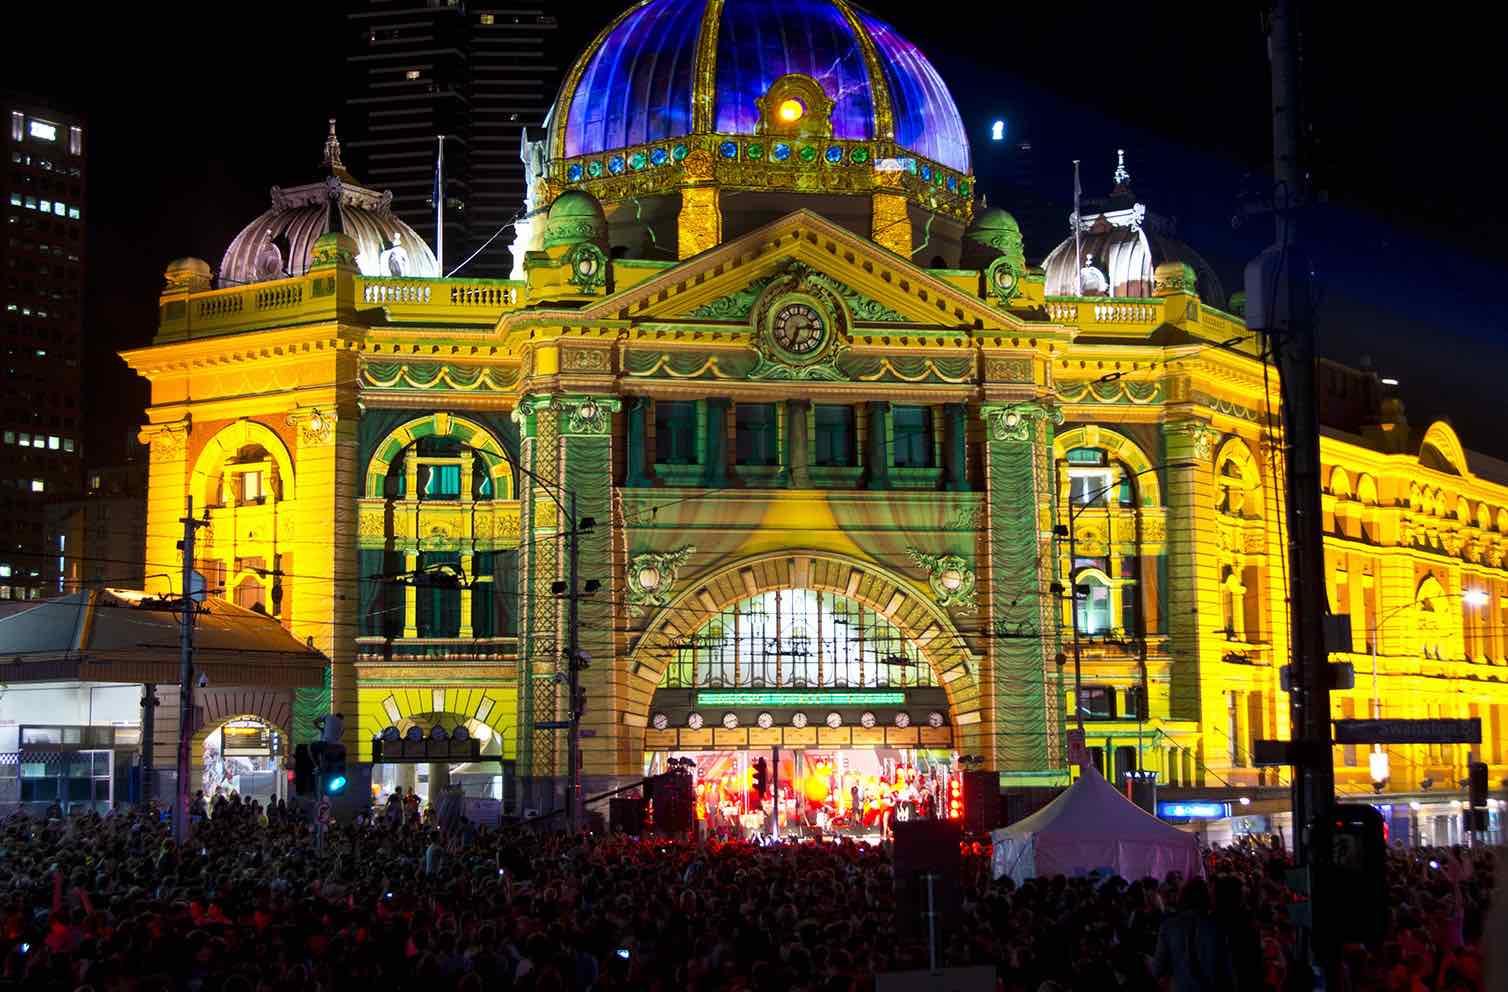 White Night arts festival at Flinders Street Station, Melbourne (Photo: Steve Collis/Flickr)